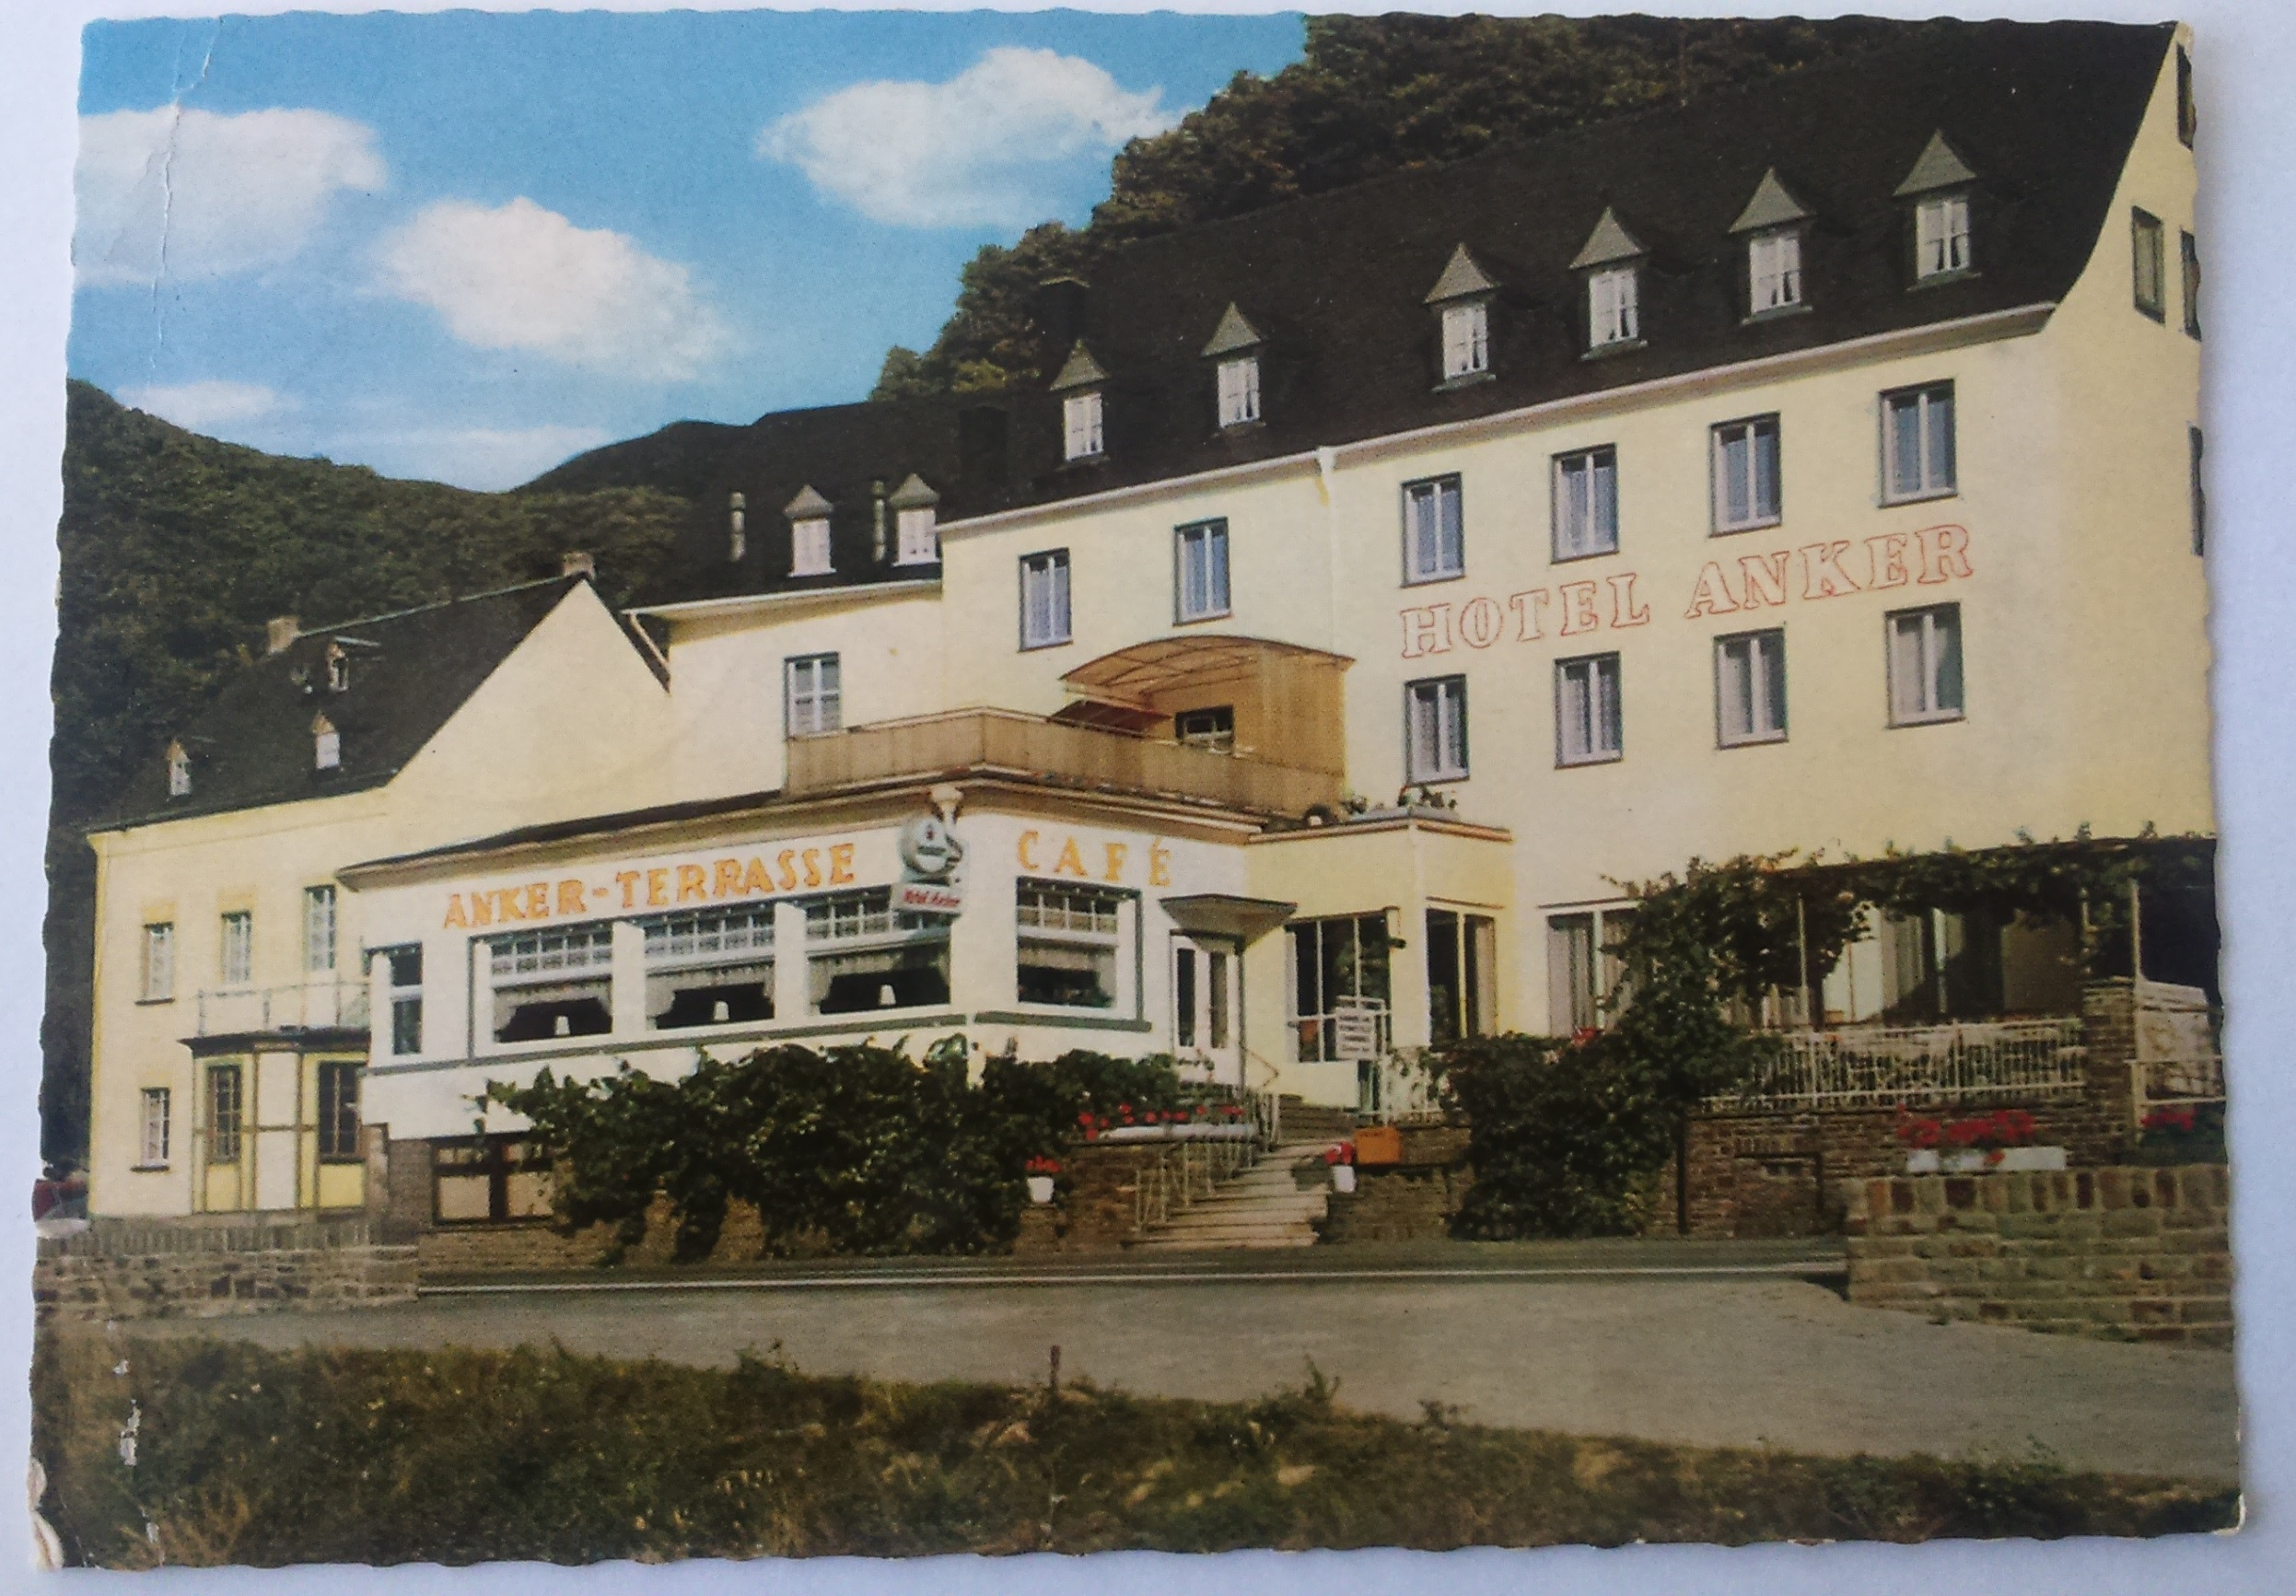 Hotel Ankerterrasse Bes. Willi Hannes Brodenbach 30.05.1968 front